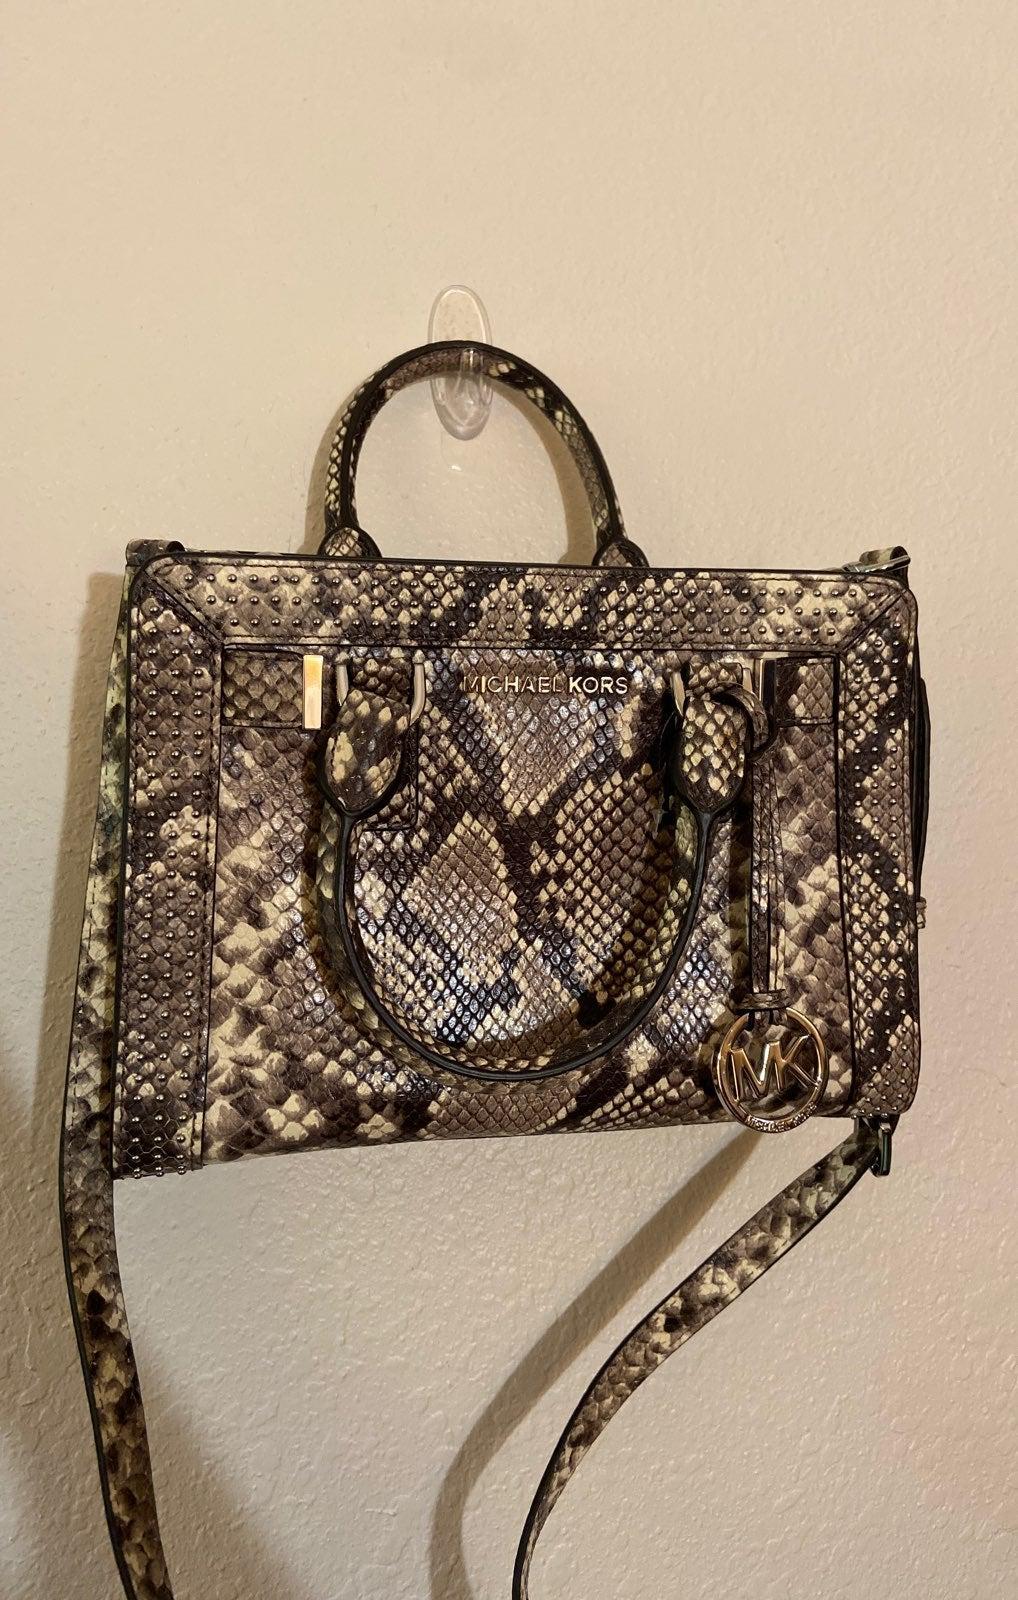 Micheal Kors Dillon purse